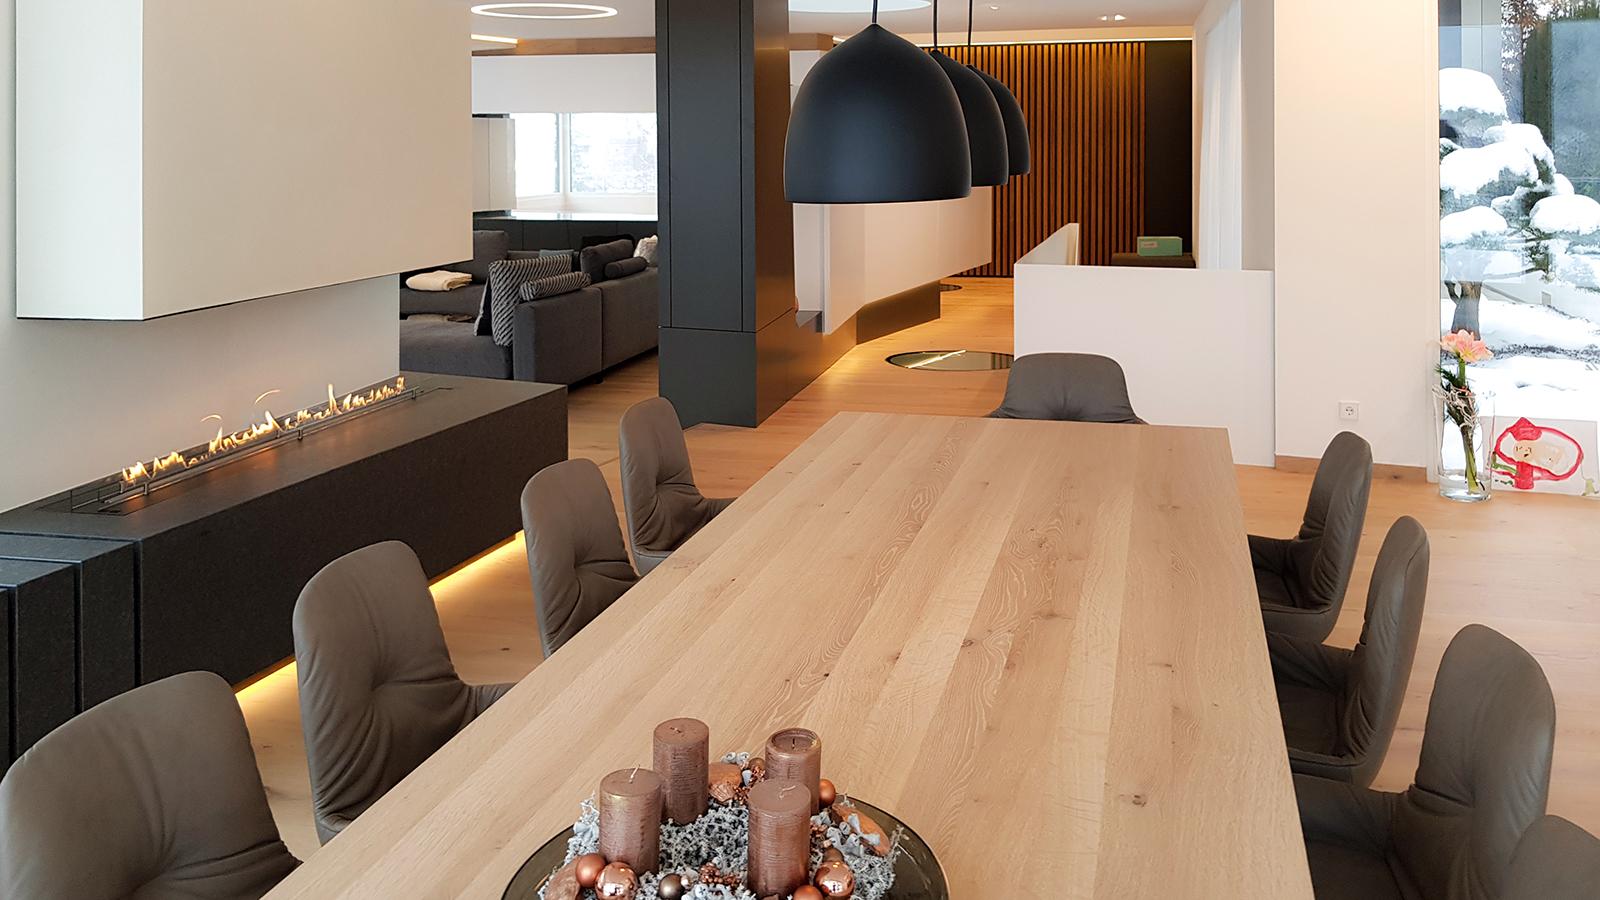 Private-Residence-Germany-Distributor-Ofen-Renz-GmbH2.jpg